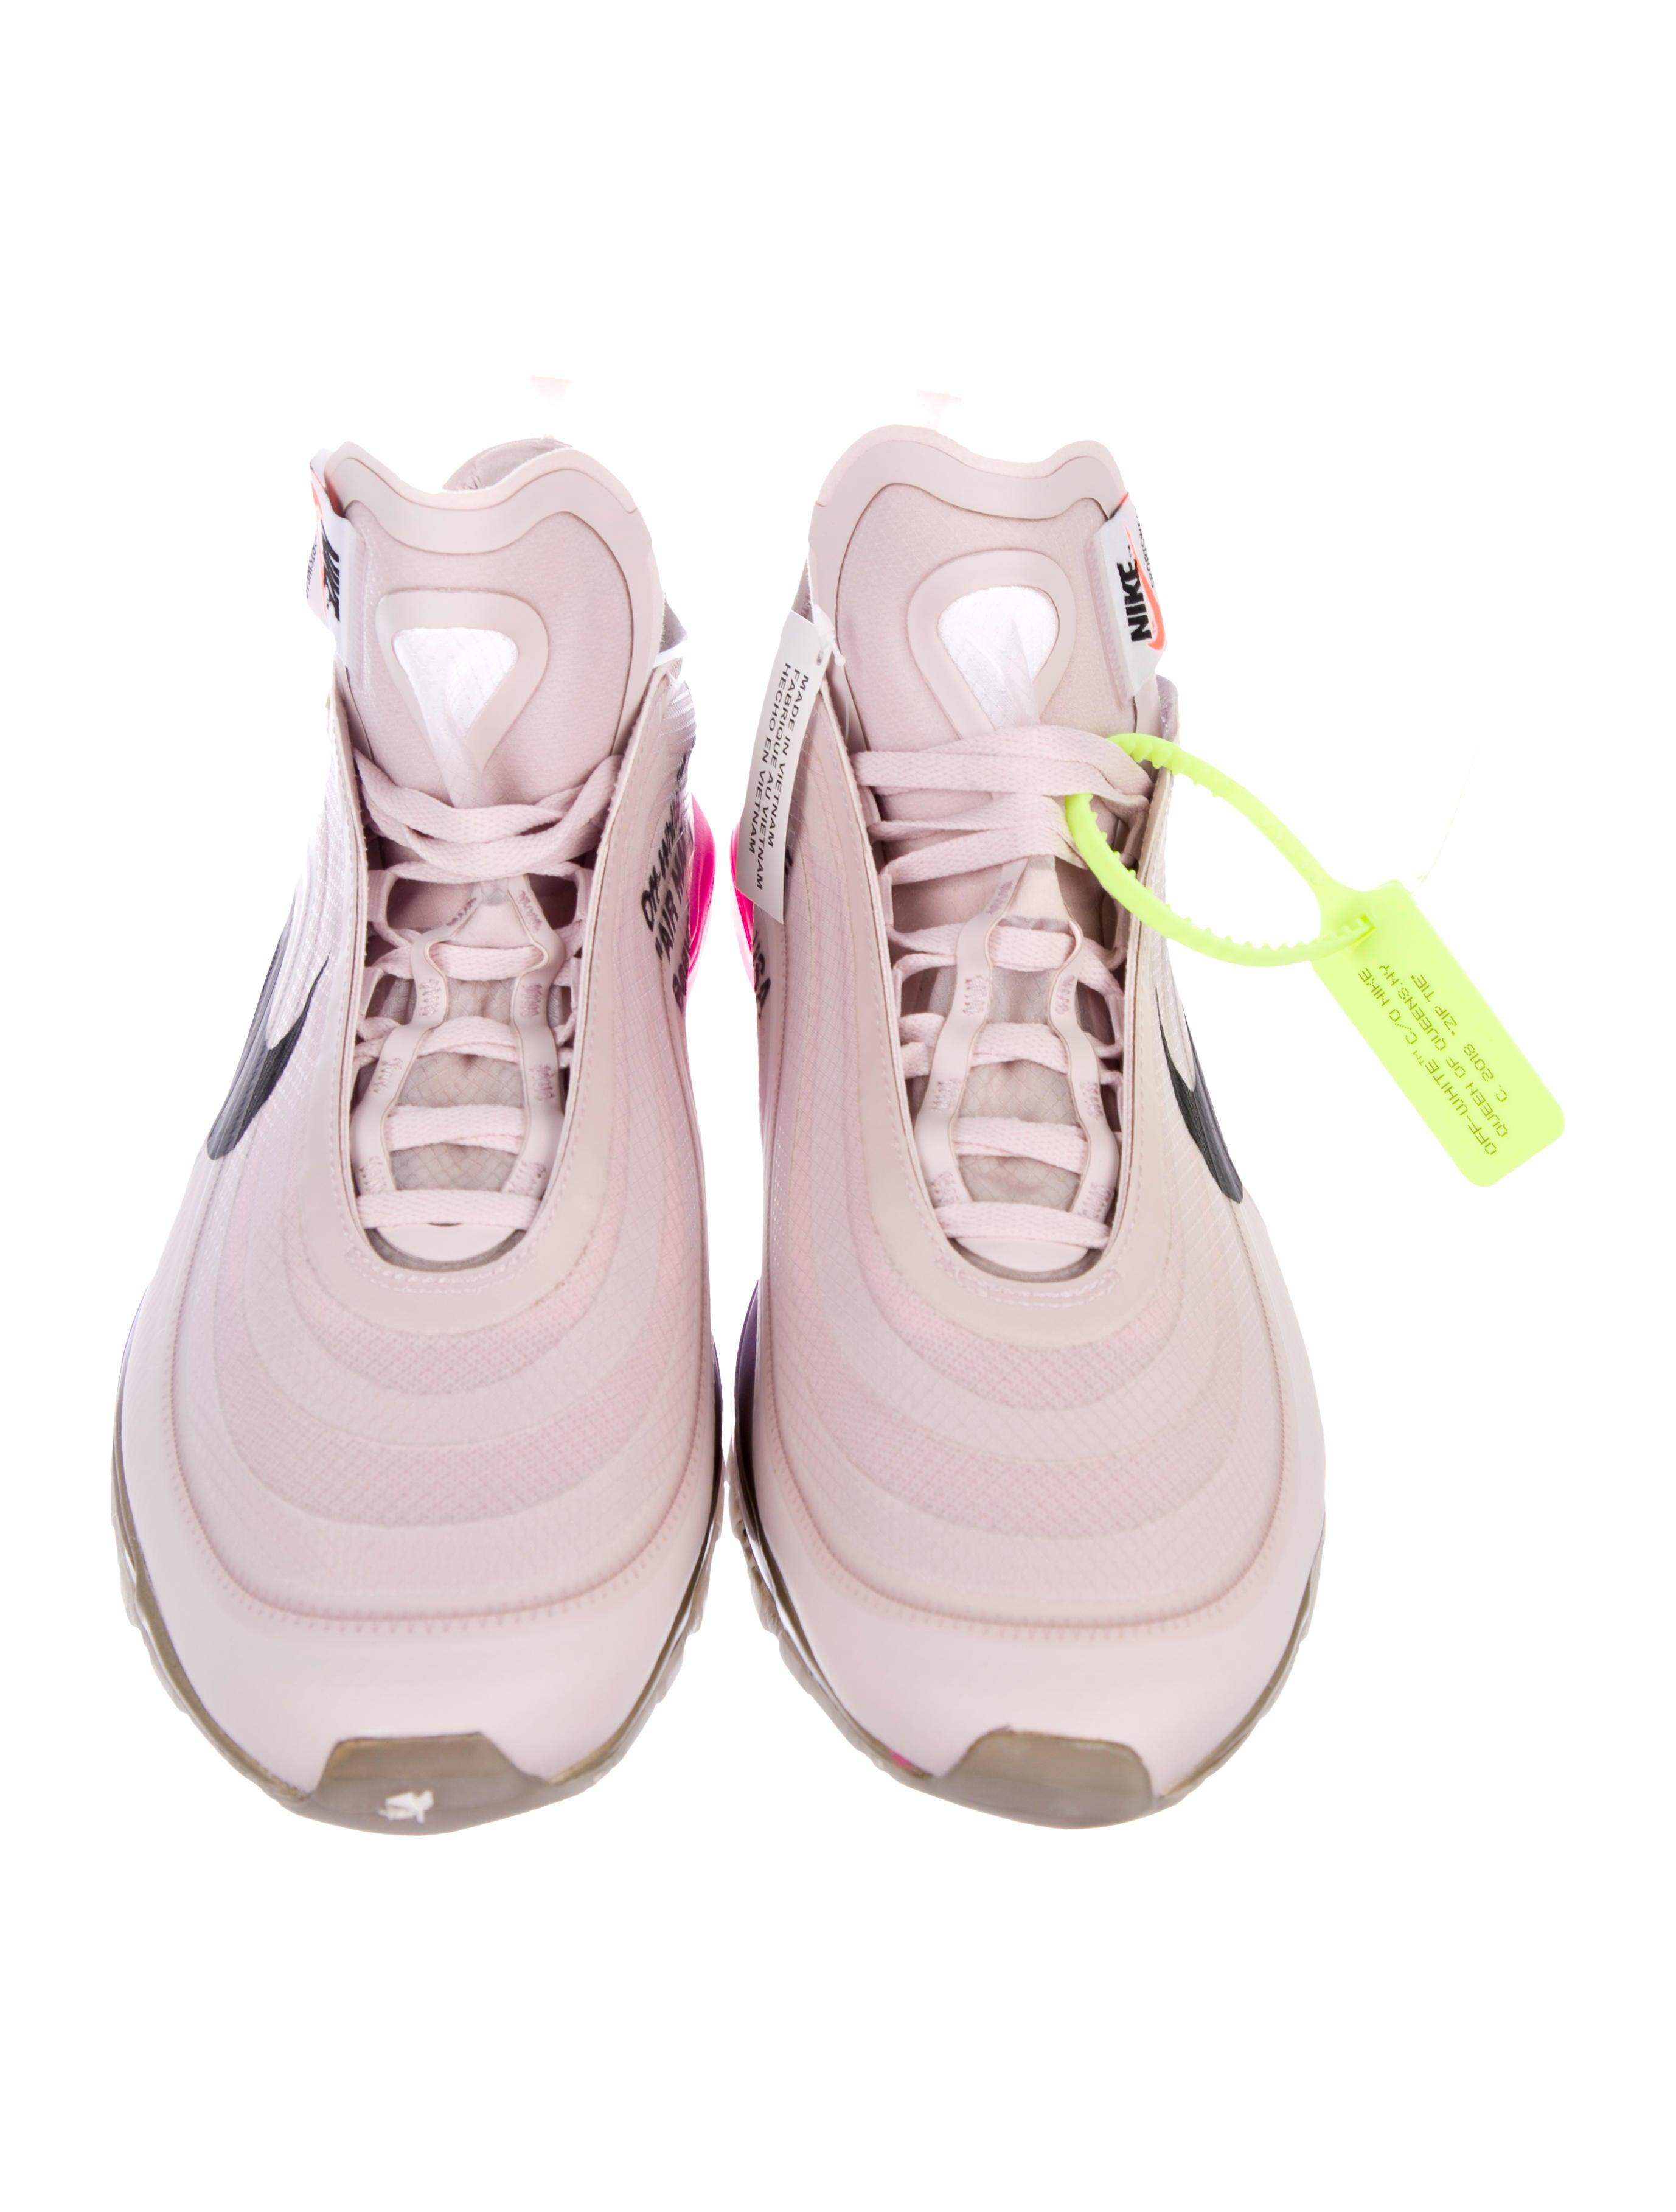 Off White x Nike The 10 Nike Air Max 97 OG 'Serena Williams